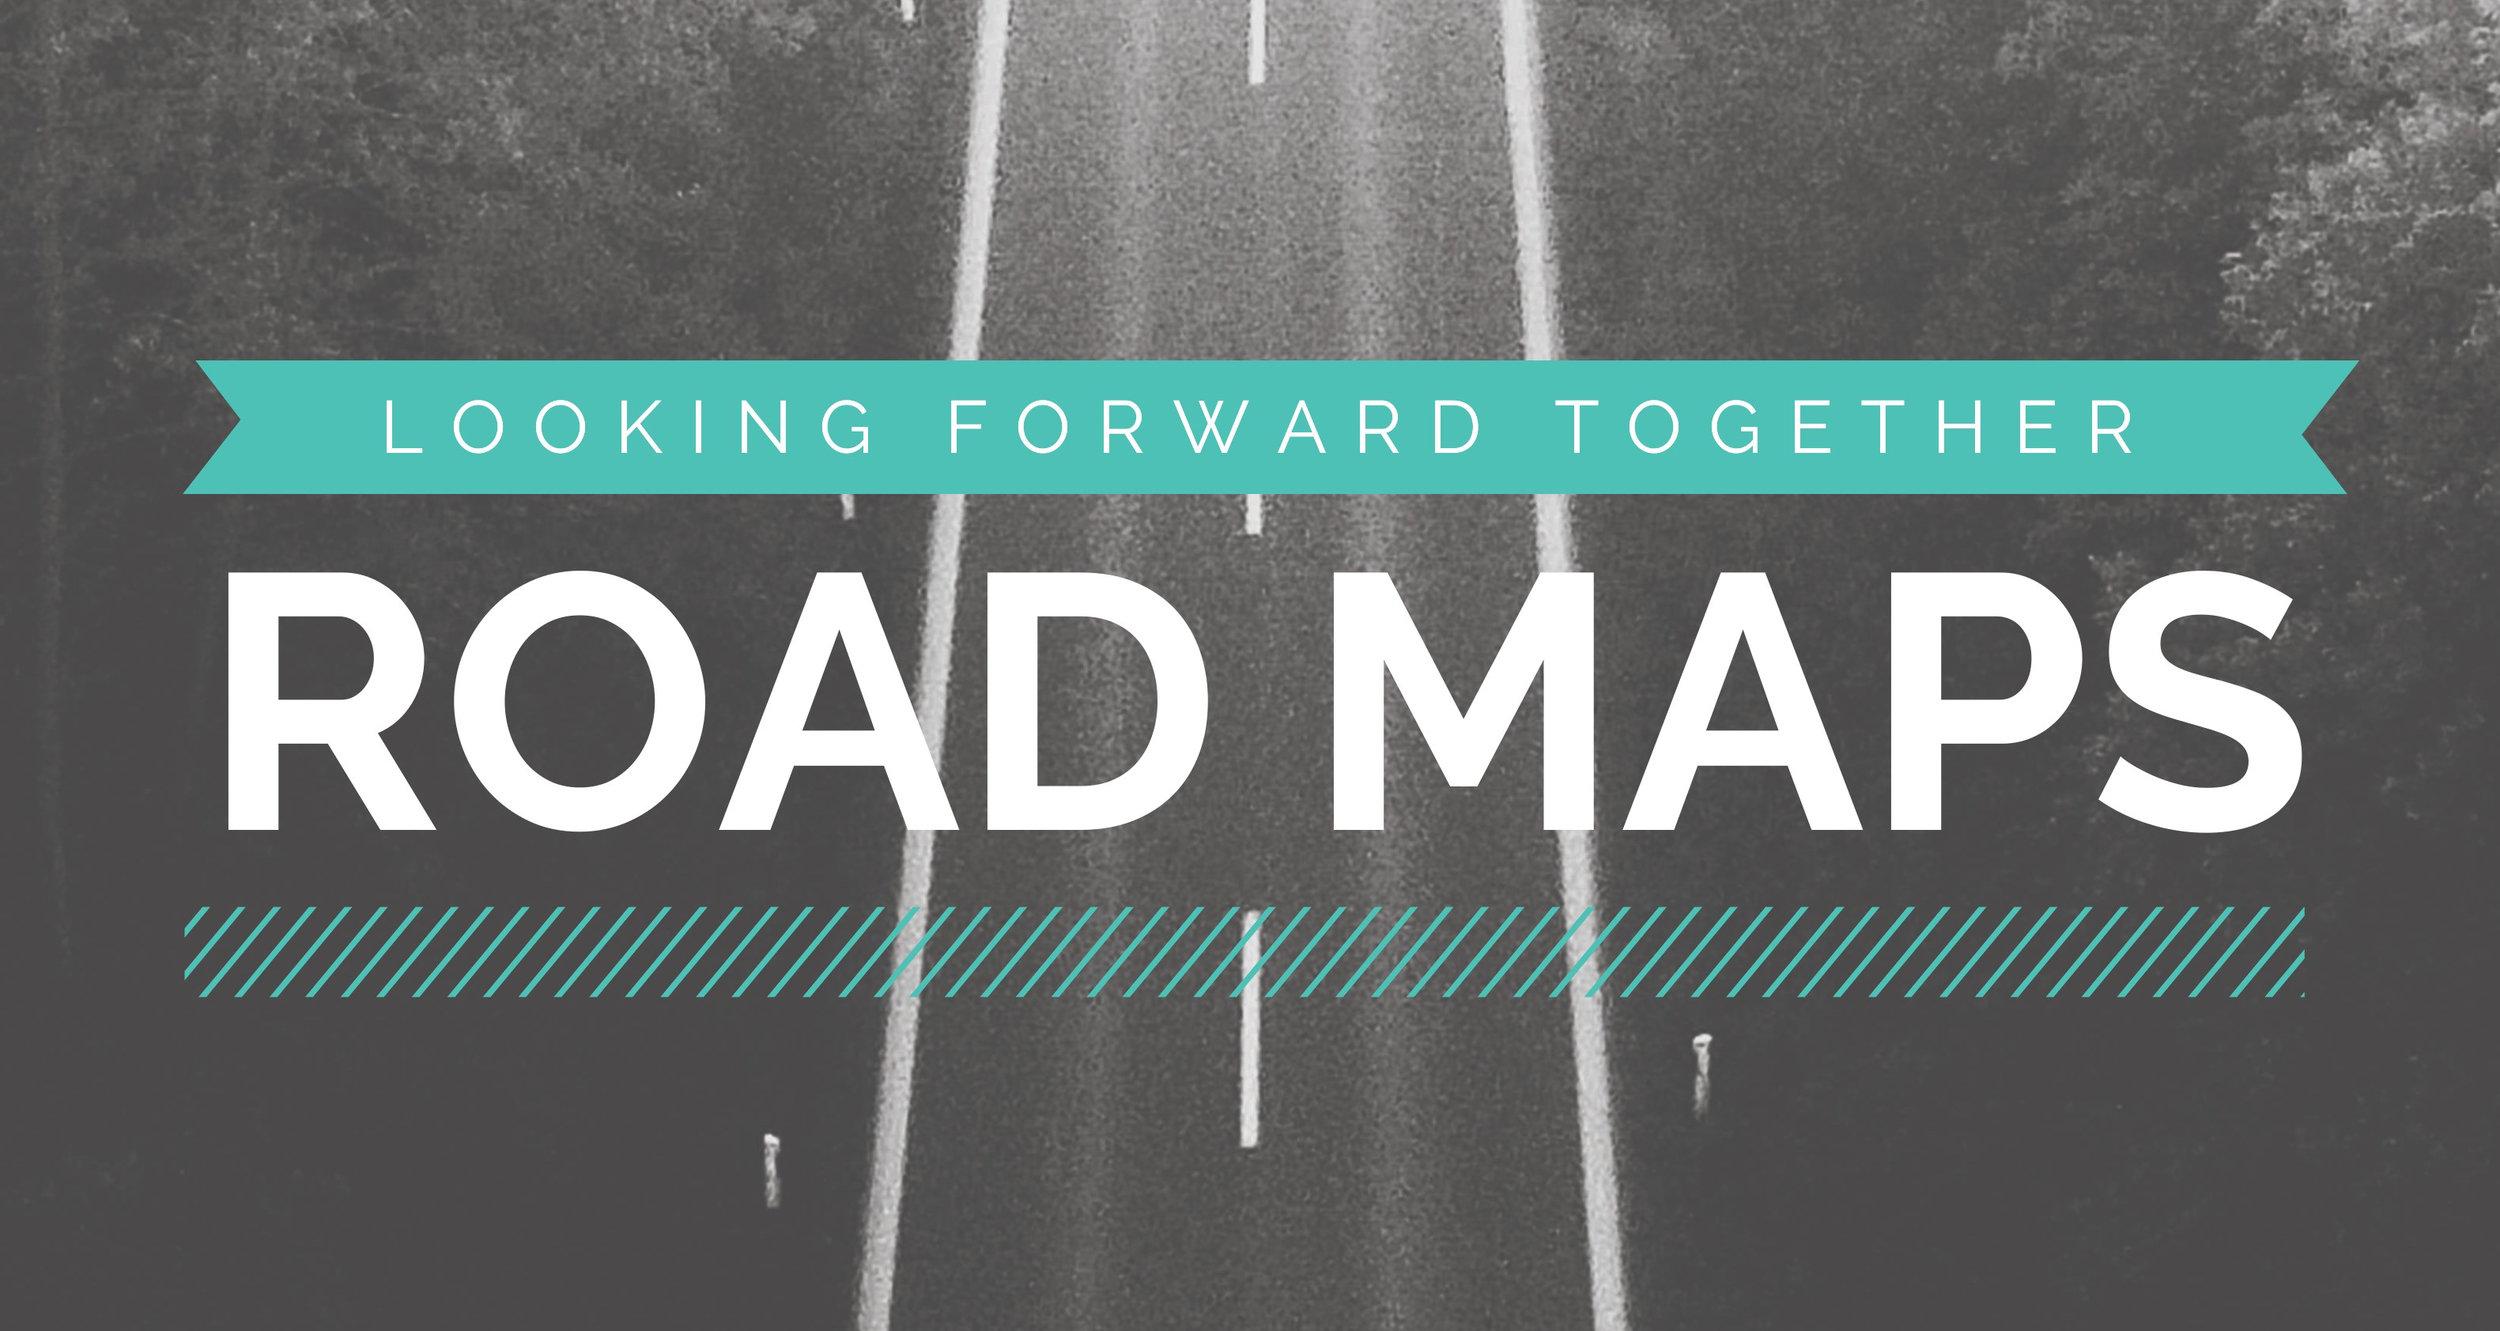 Road Maps (16-9).jpg